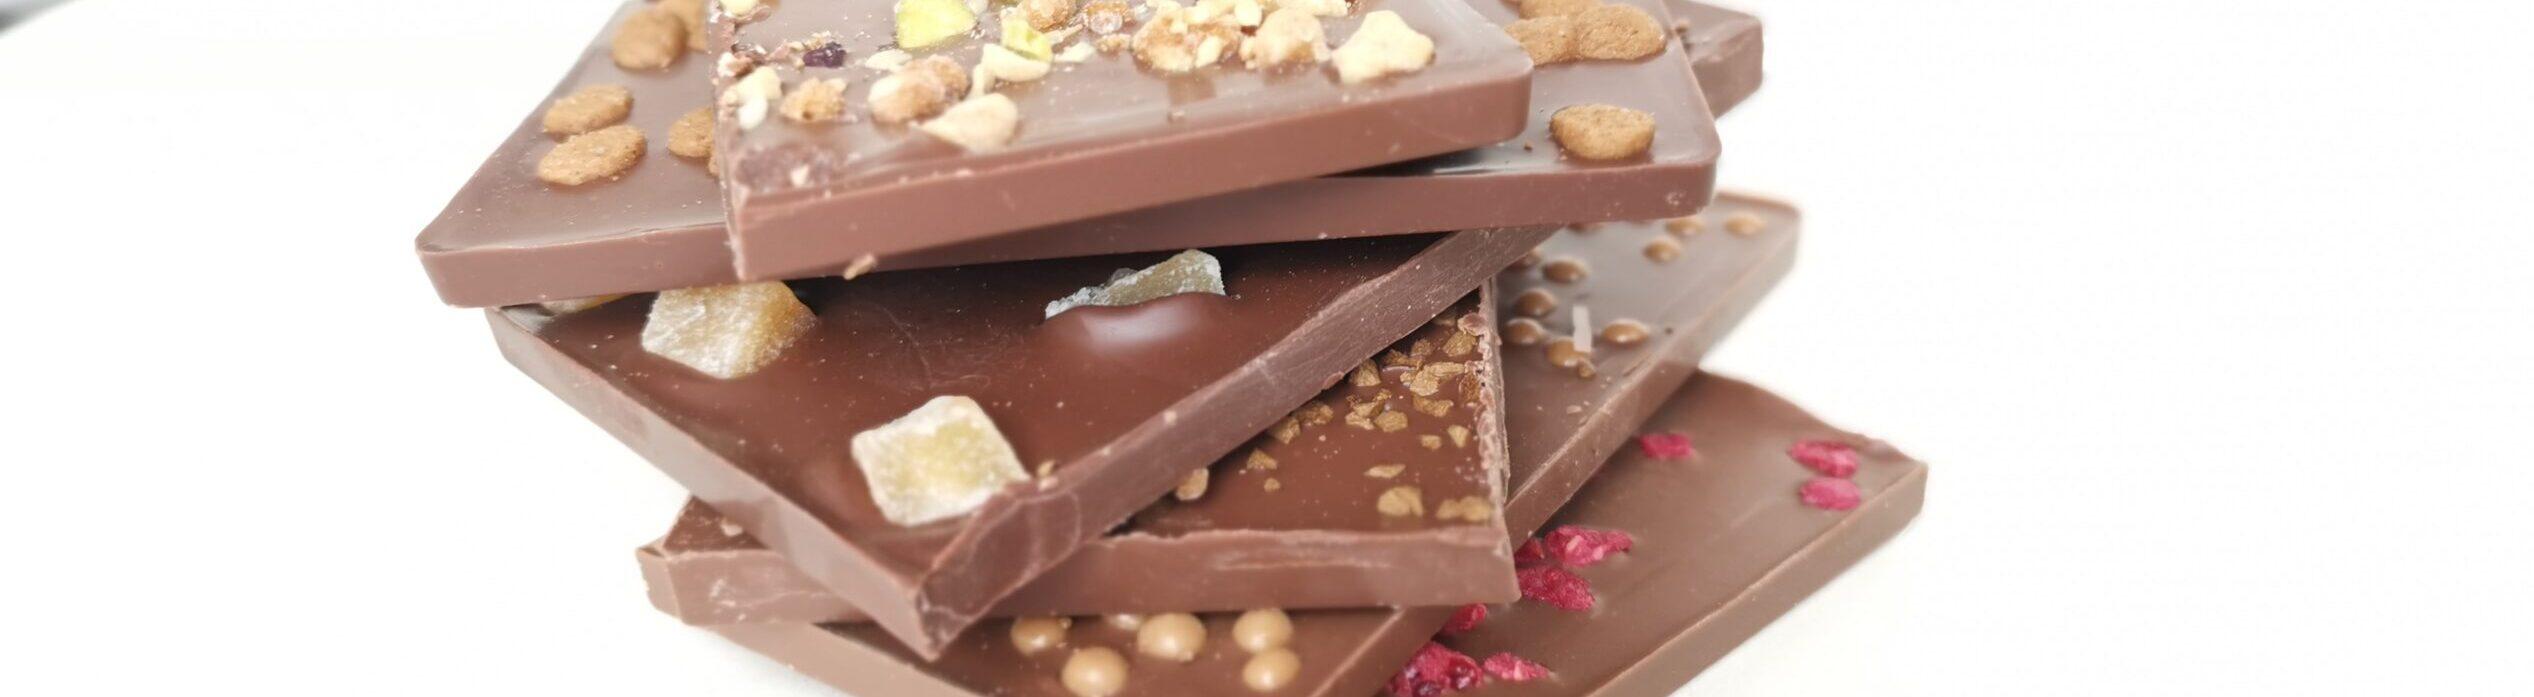 SUBZERO°S chocolade